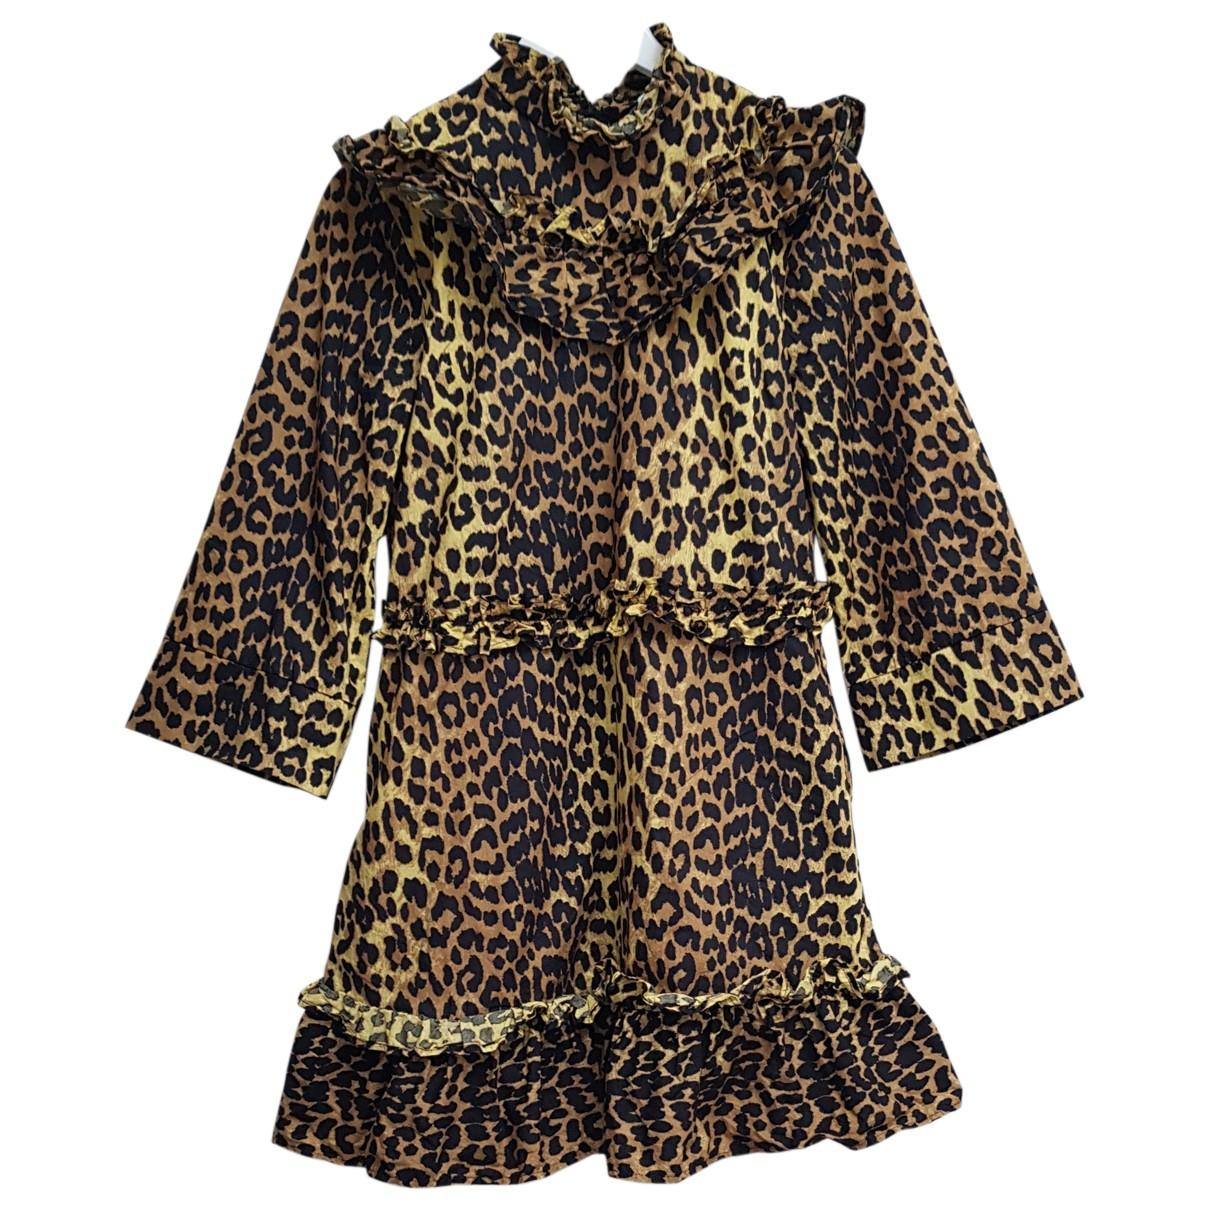 Ganni - Robe Spring Summer 2020 pour femme en coton - beige